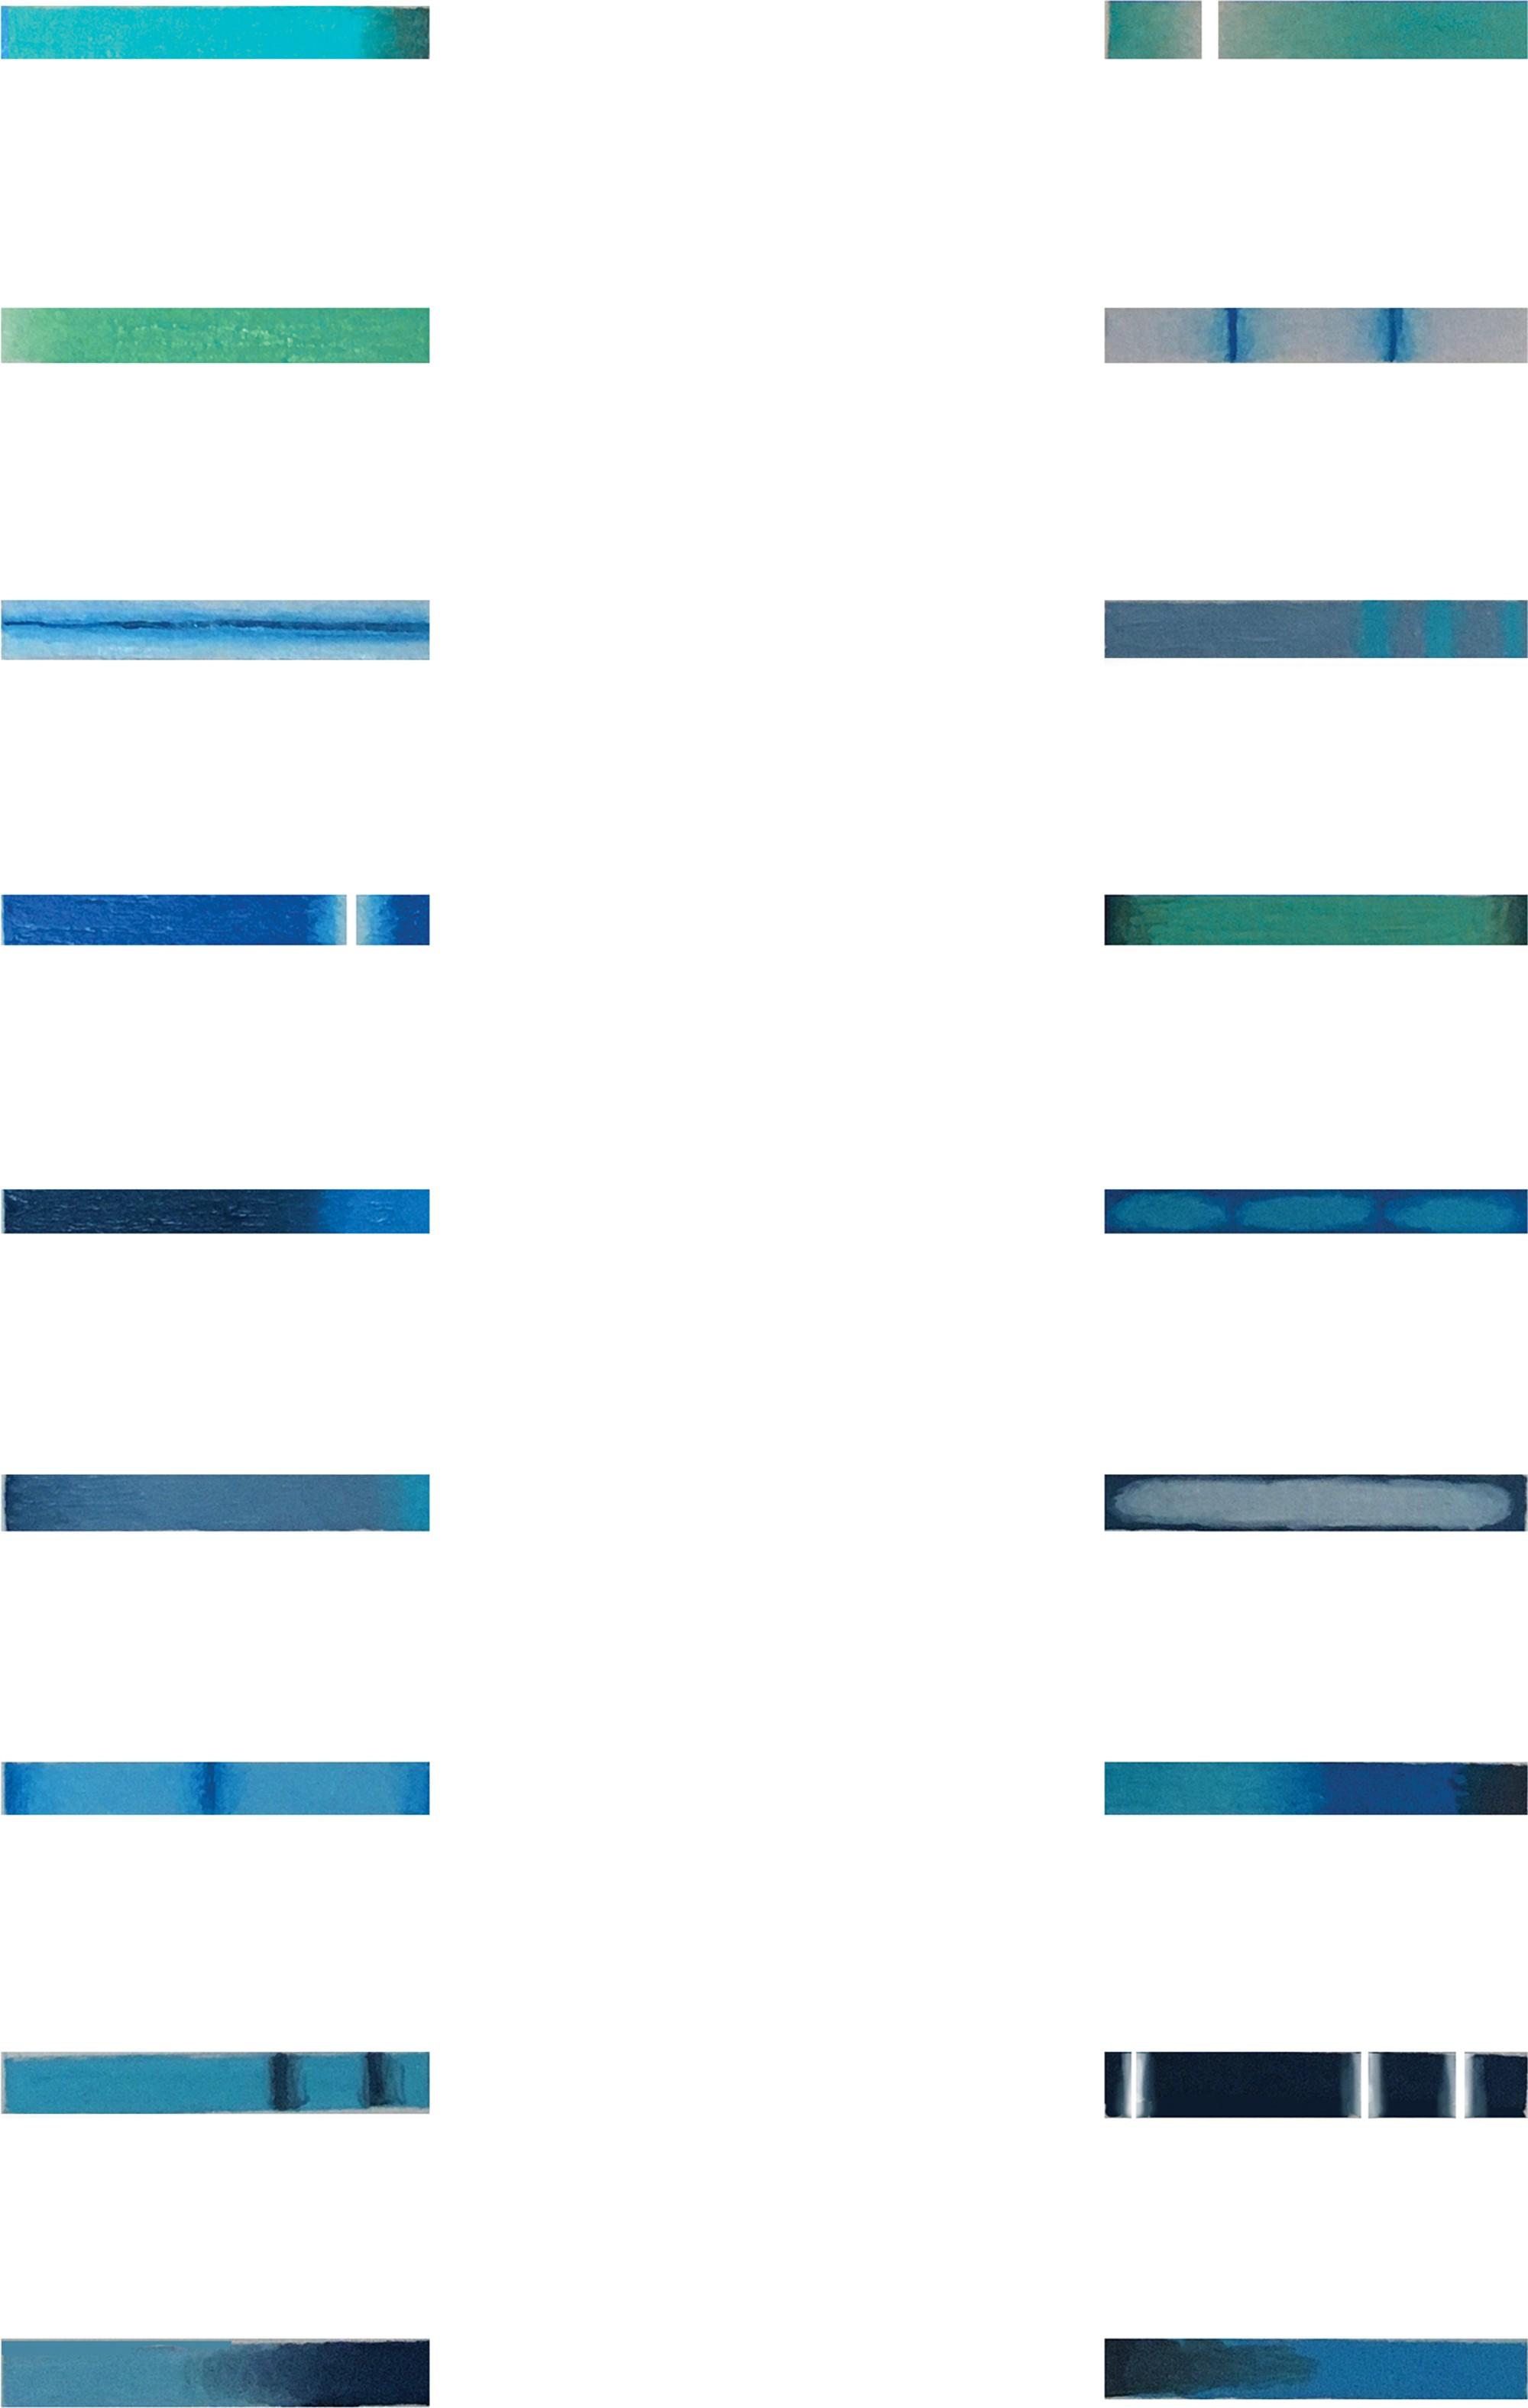 Data for Finite Object by Ashley Eliza Williams